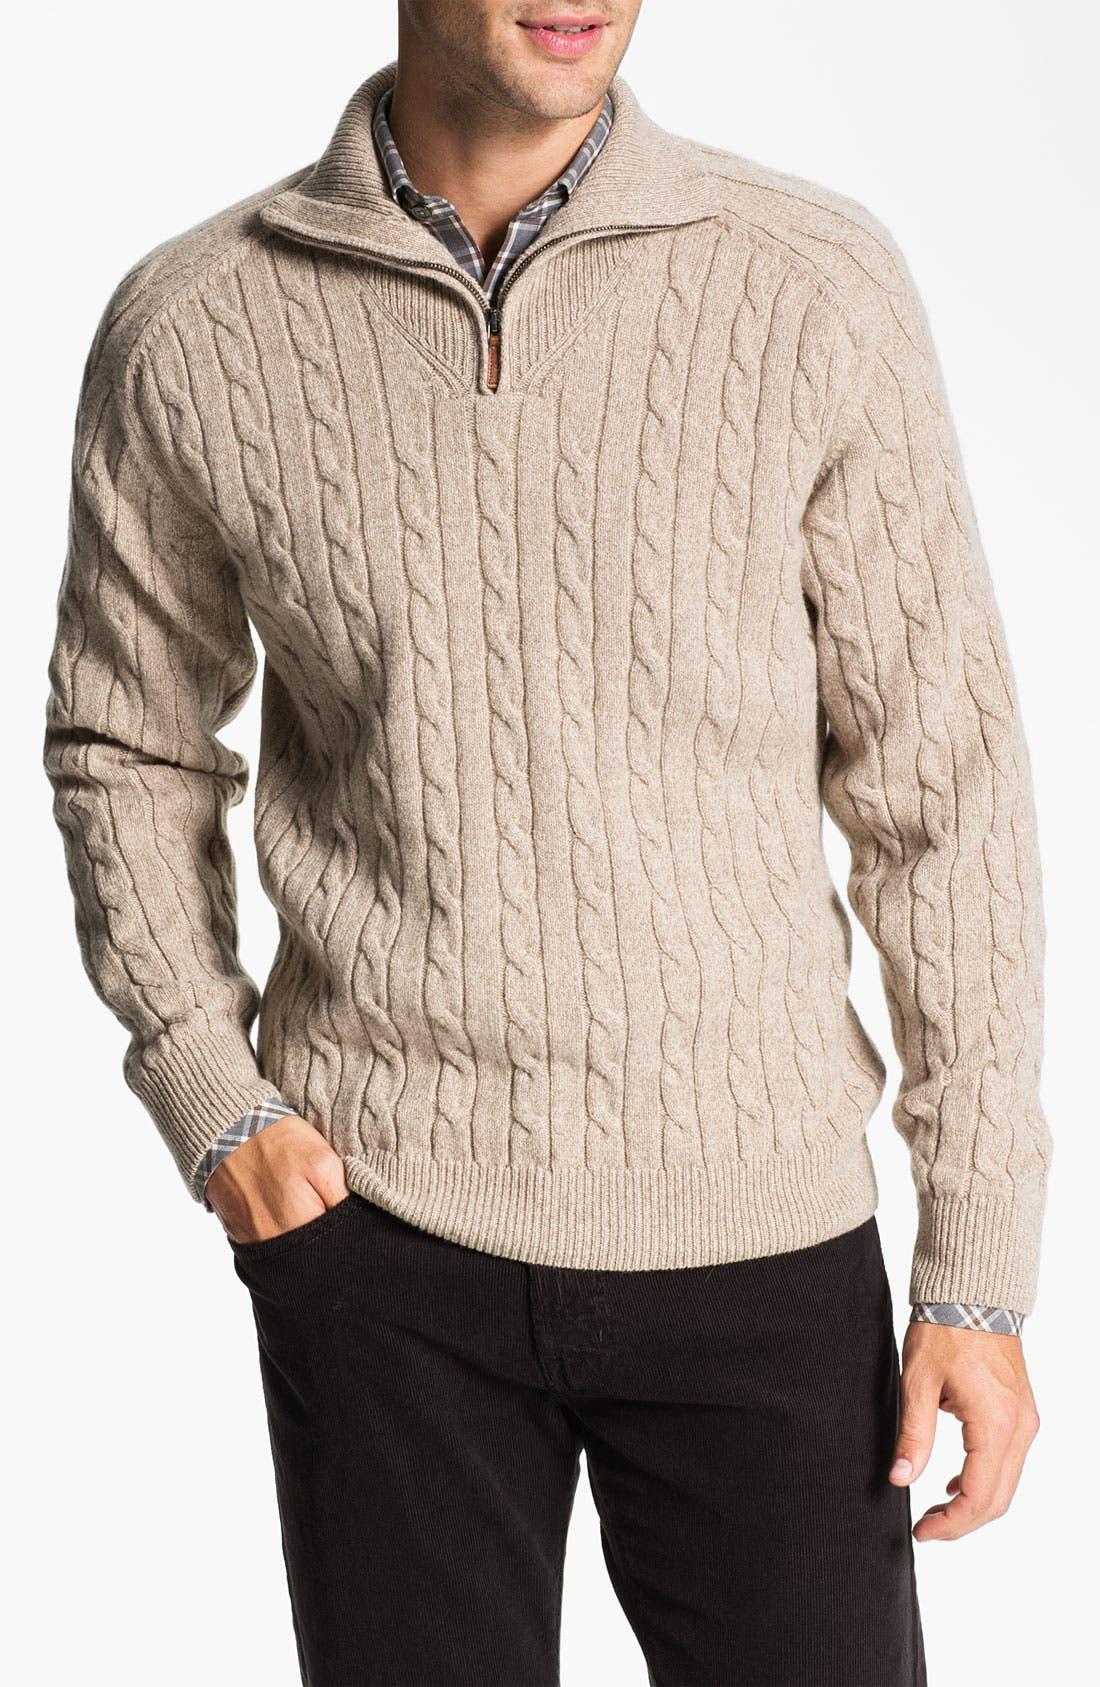 Main Image - Lora Gi Half Zip Wool & Cashmere Sweater